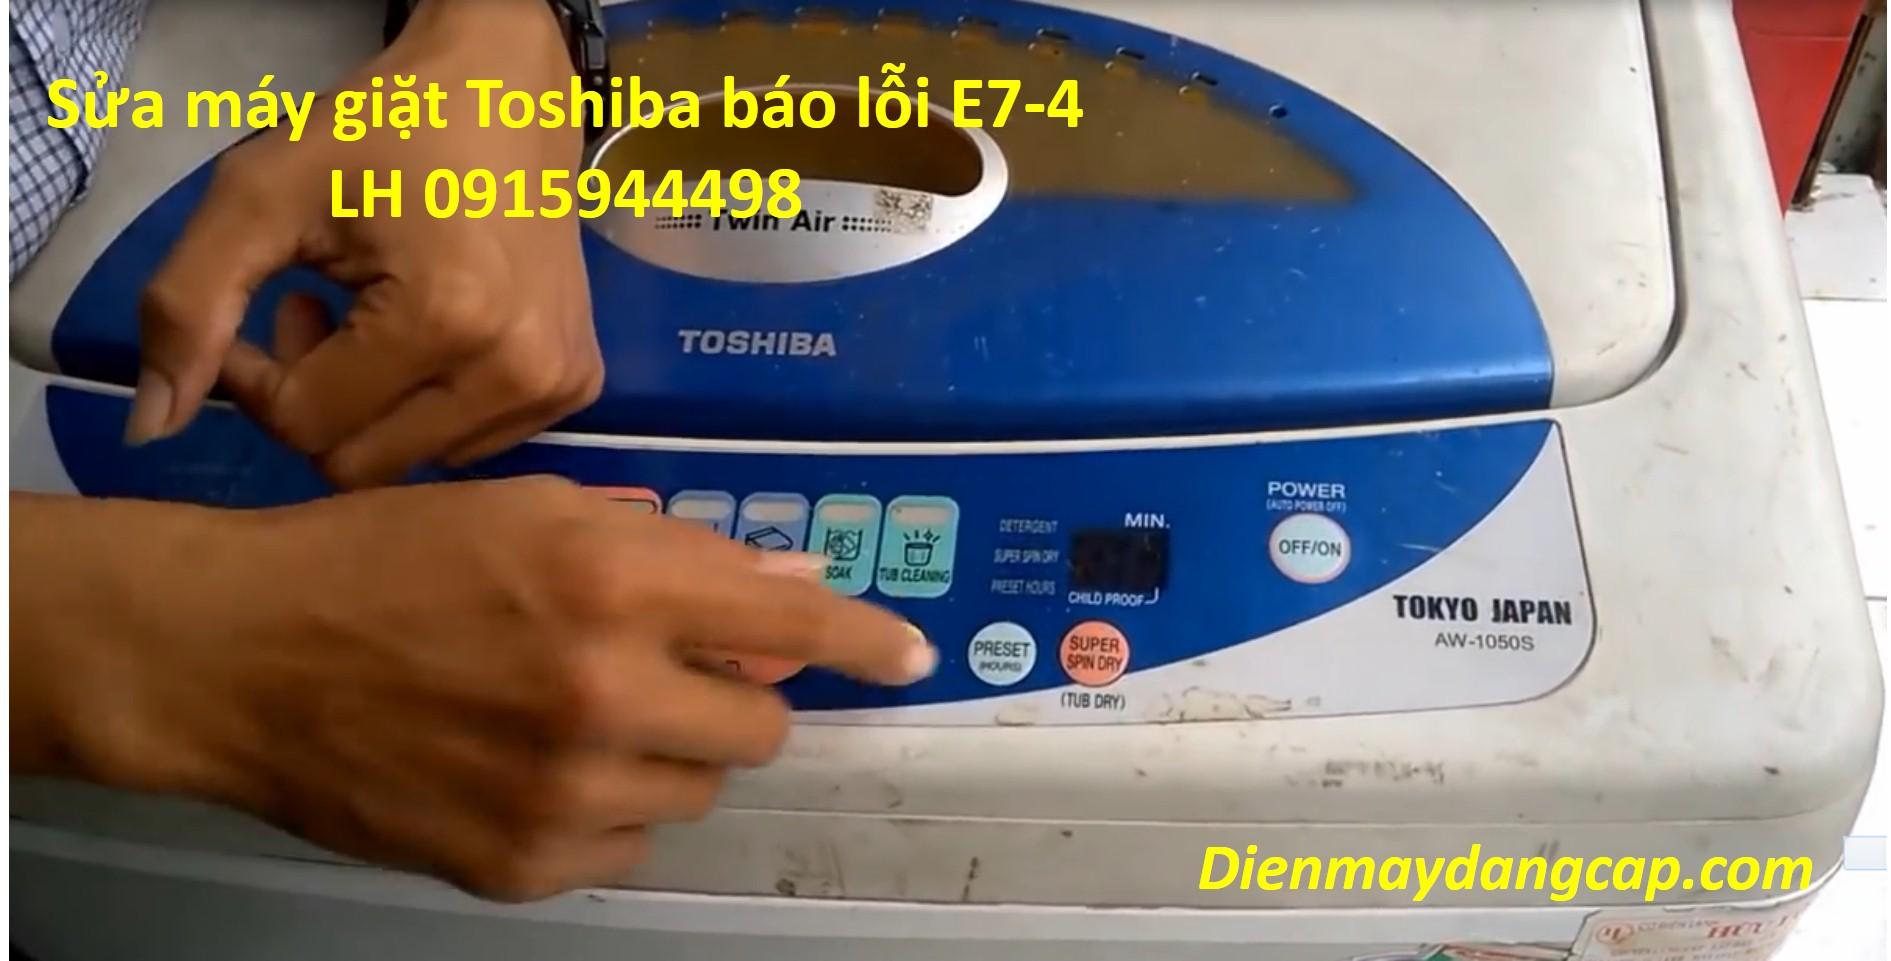 Sửa chữa máy giặt Toshiba báo lỗi E7-4